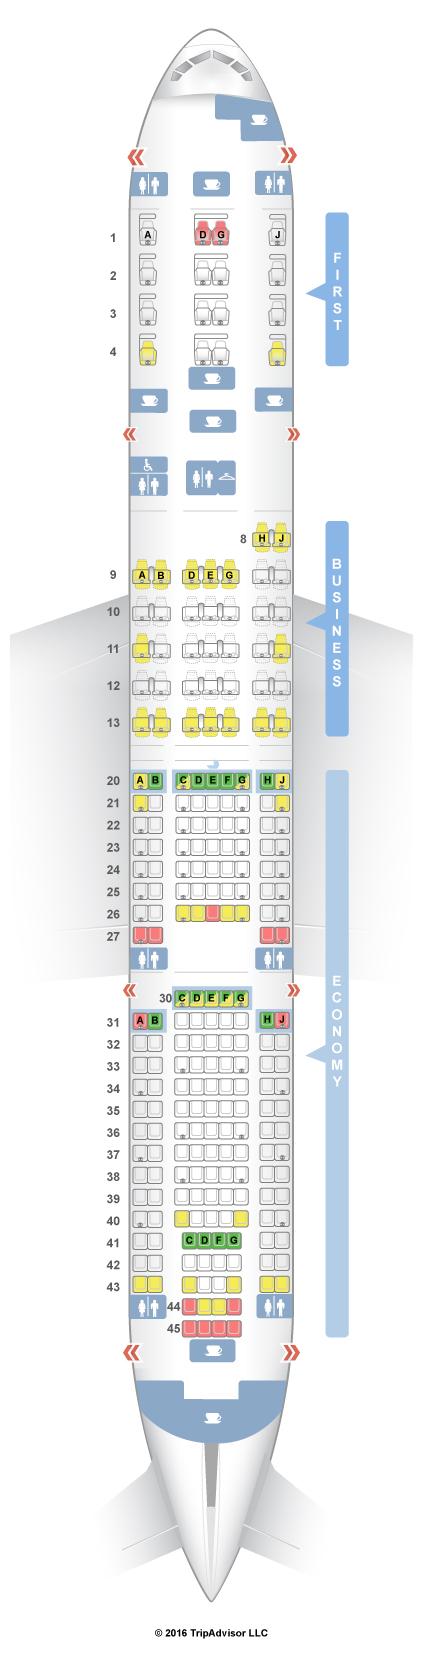 SeatGuru Seat Map American Airlines Boeing 777-200 (777) V1